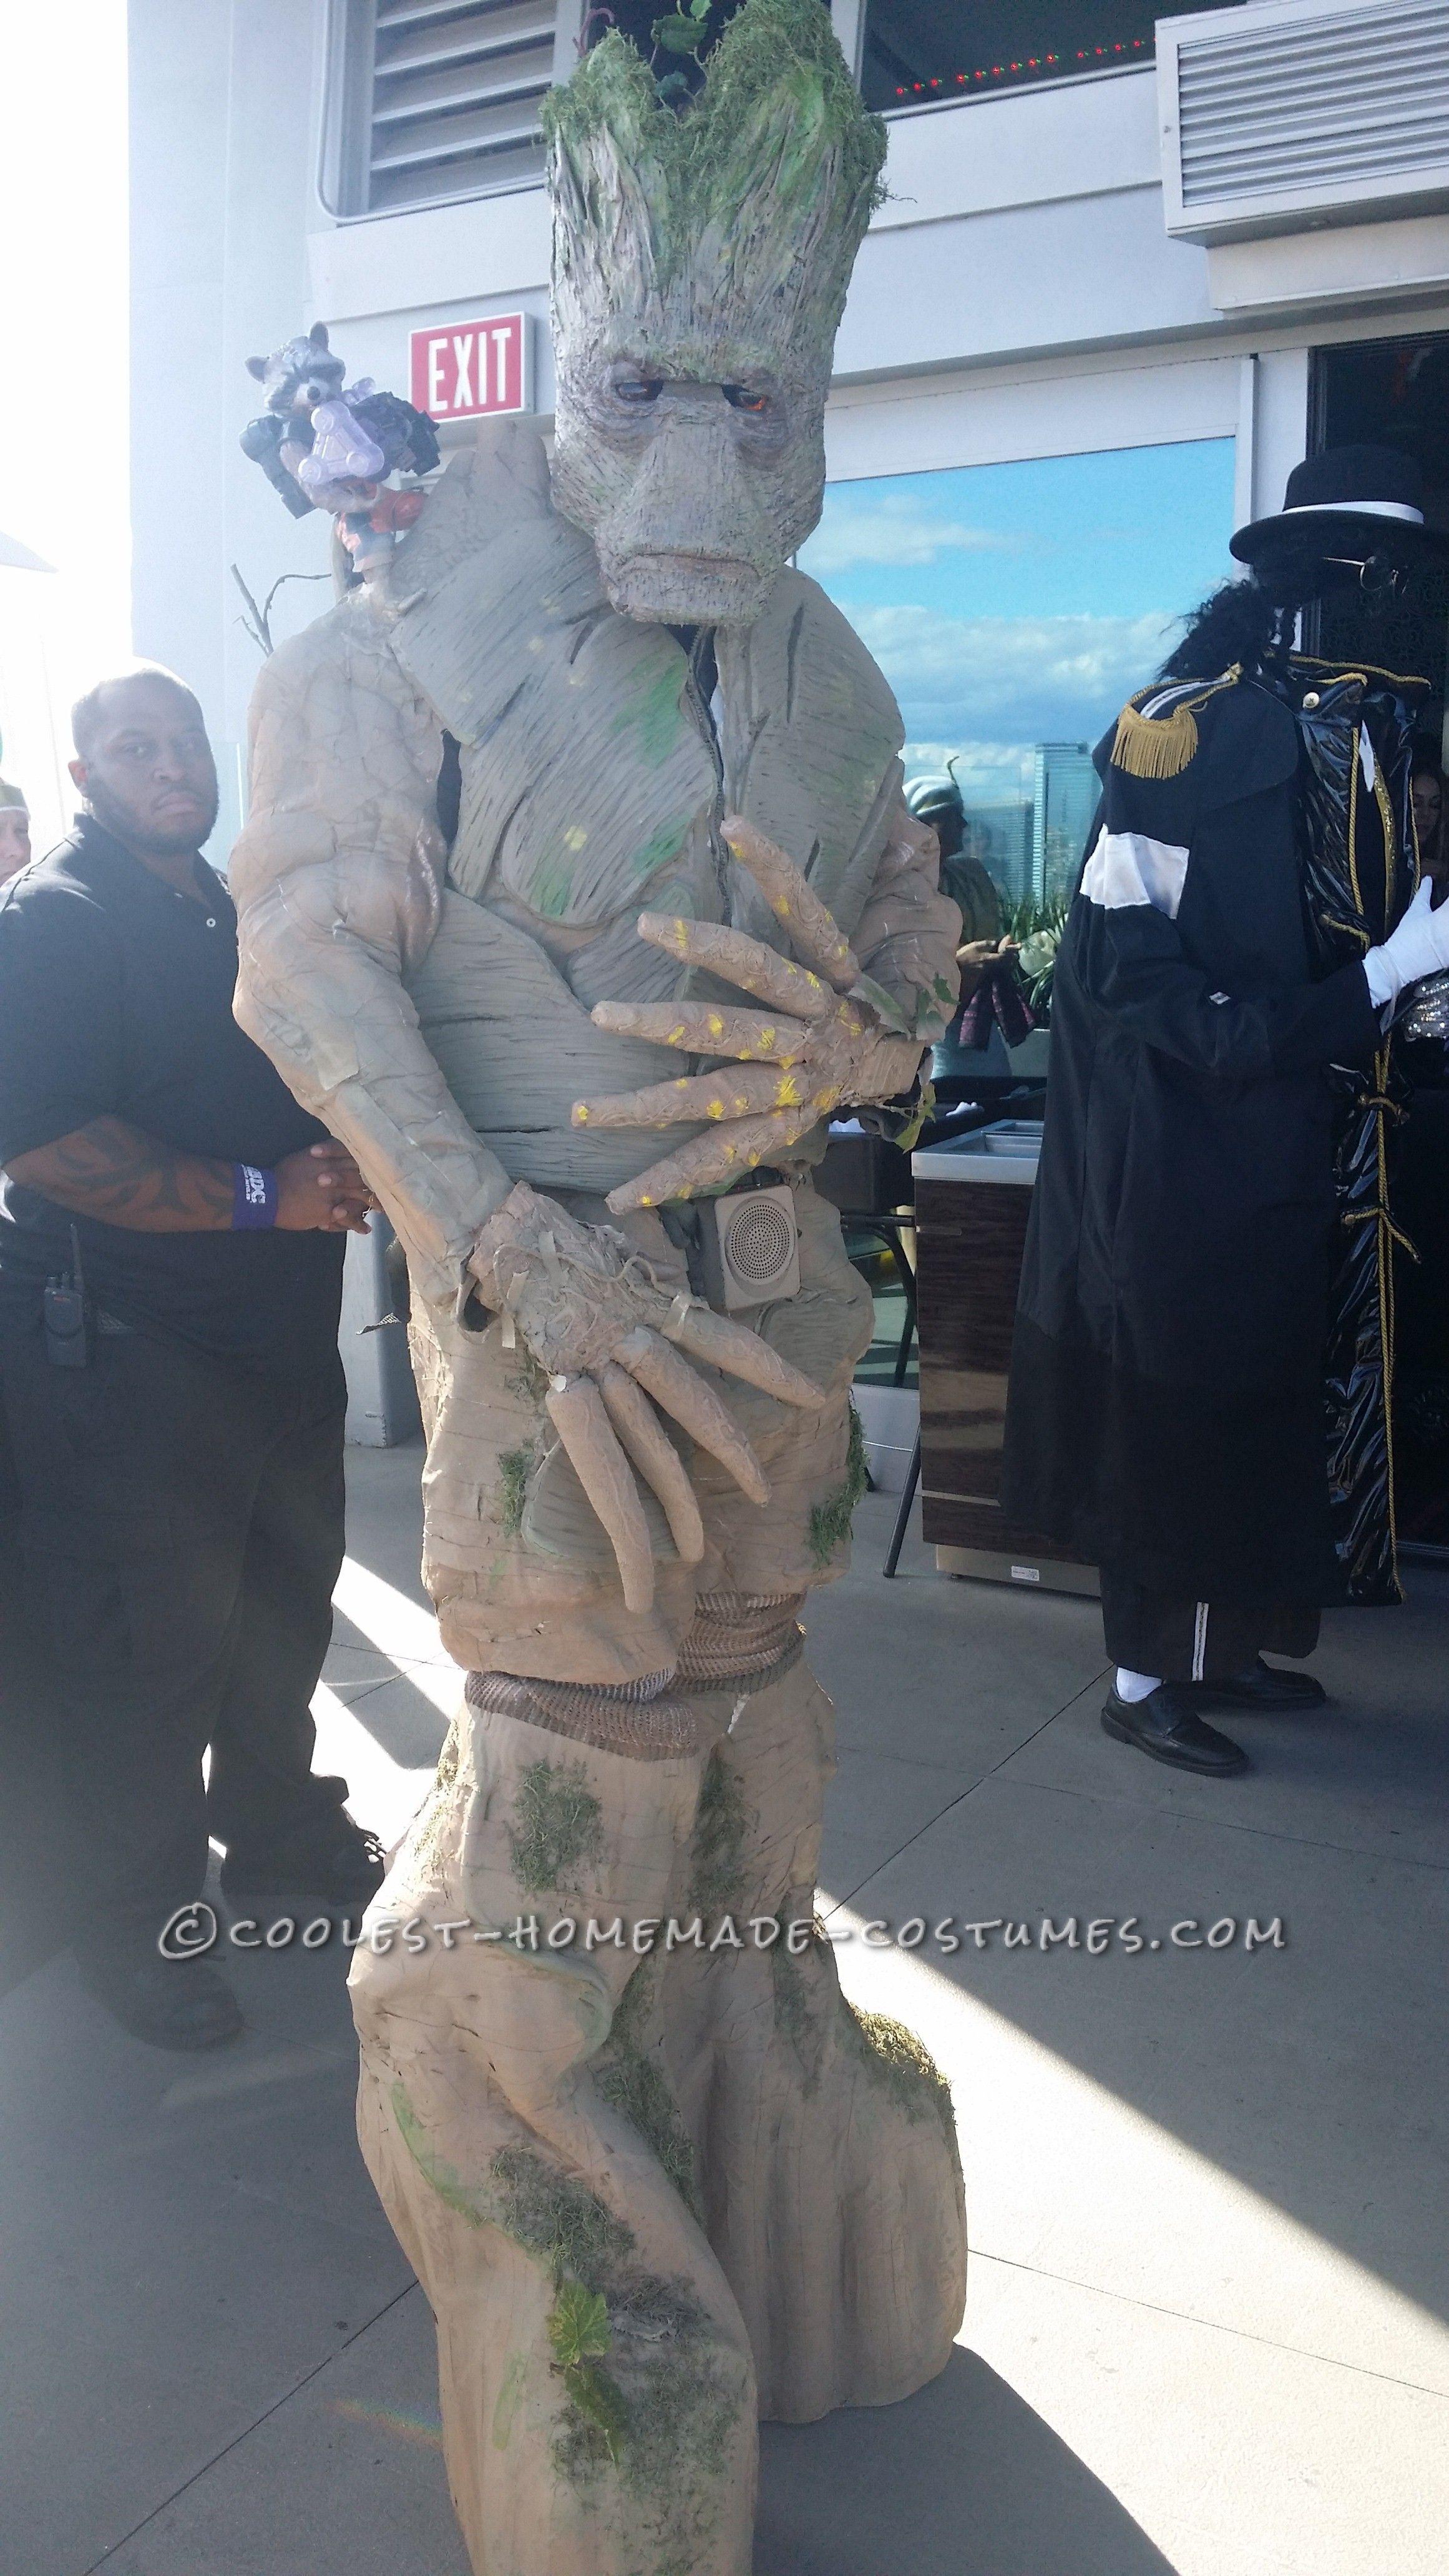 Amazing 8u2032 Tall Homemade Groot Costume... Coolest Halloween Costume Contest & Amazing 8u0027 Tall Homemade Groot Costume | Pinterest | Halloween ...